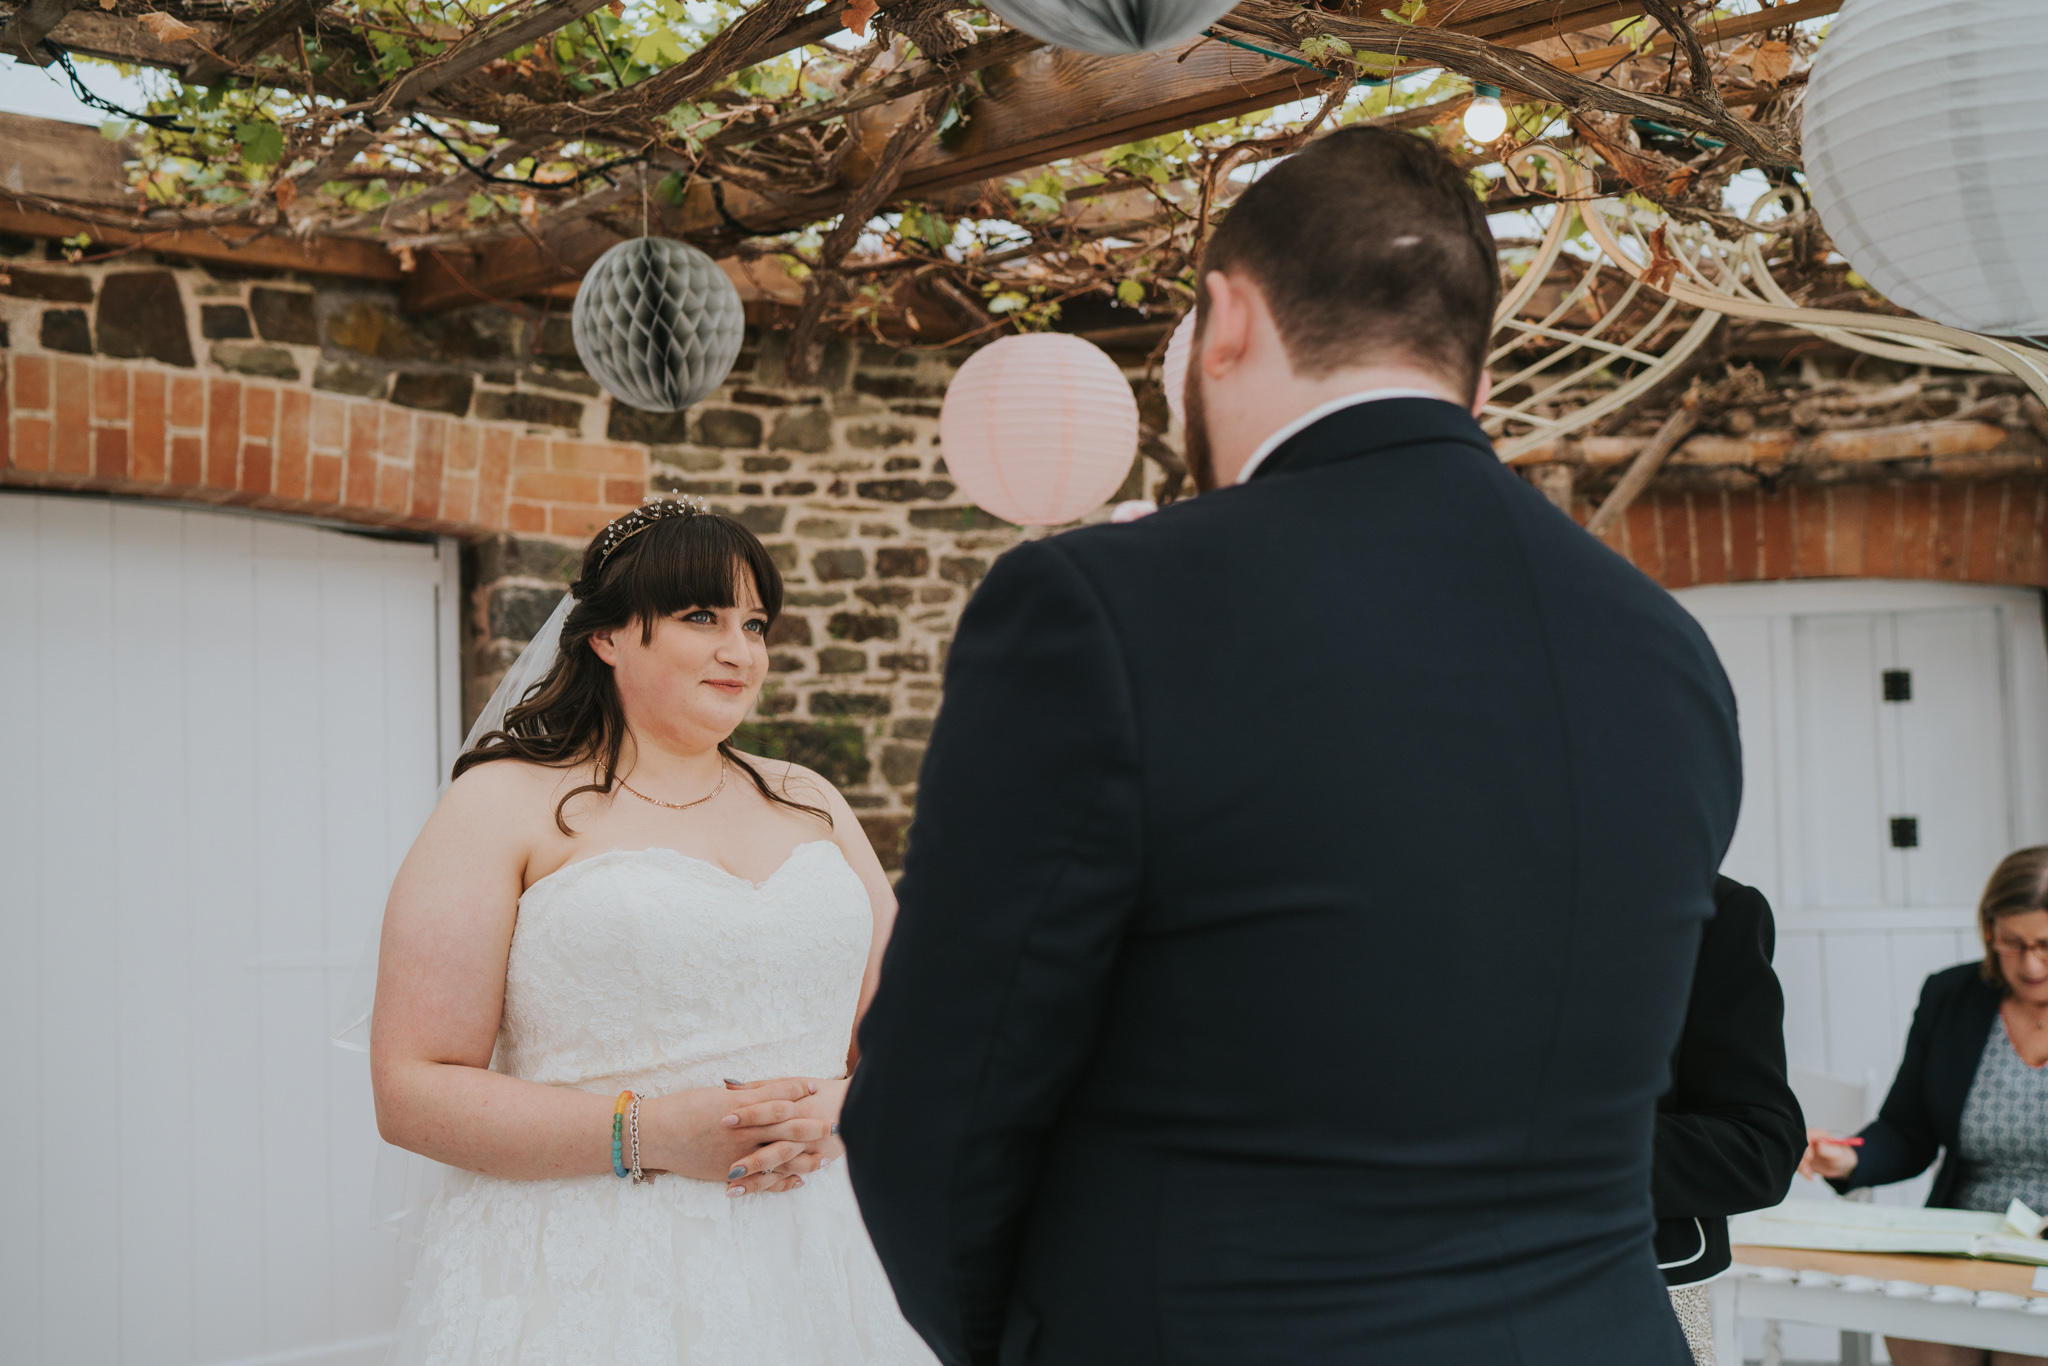 grace-sam-old-barn-clovelly-devon-wedding-photographer-grace-elizabeth-essex-suffolk-norfolk-wedding-photographer (54 of 132).jpg